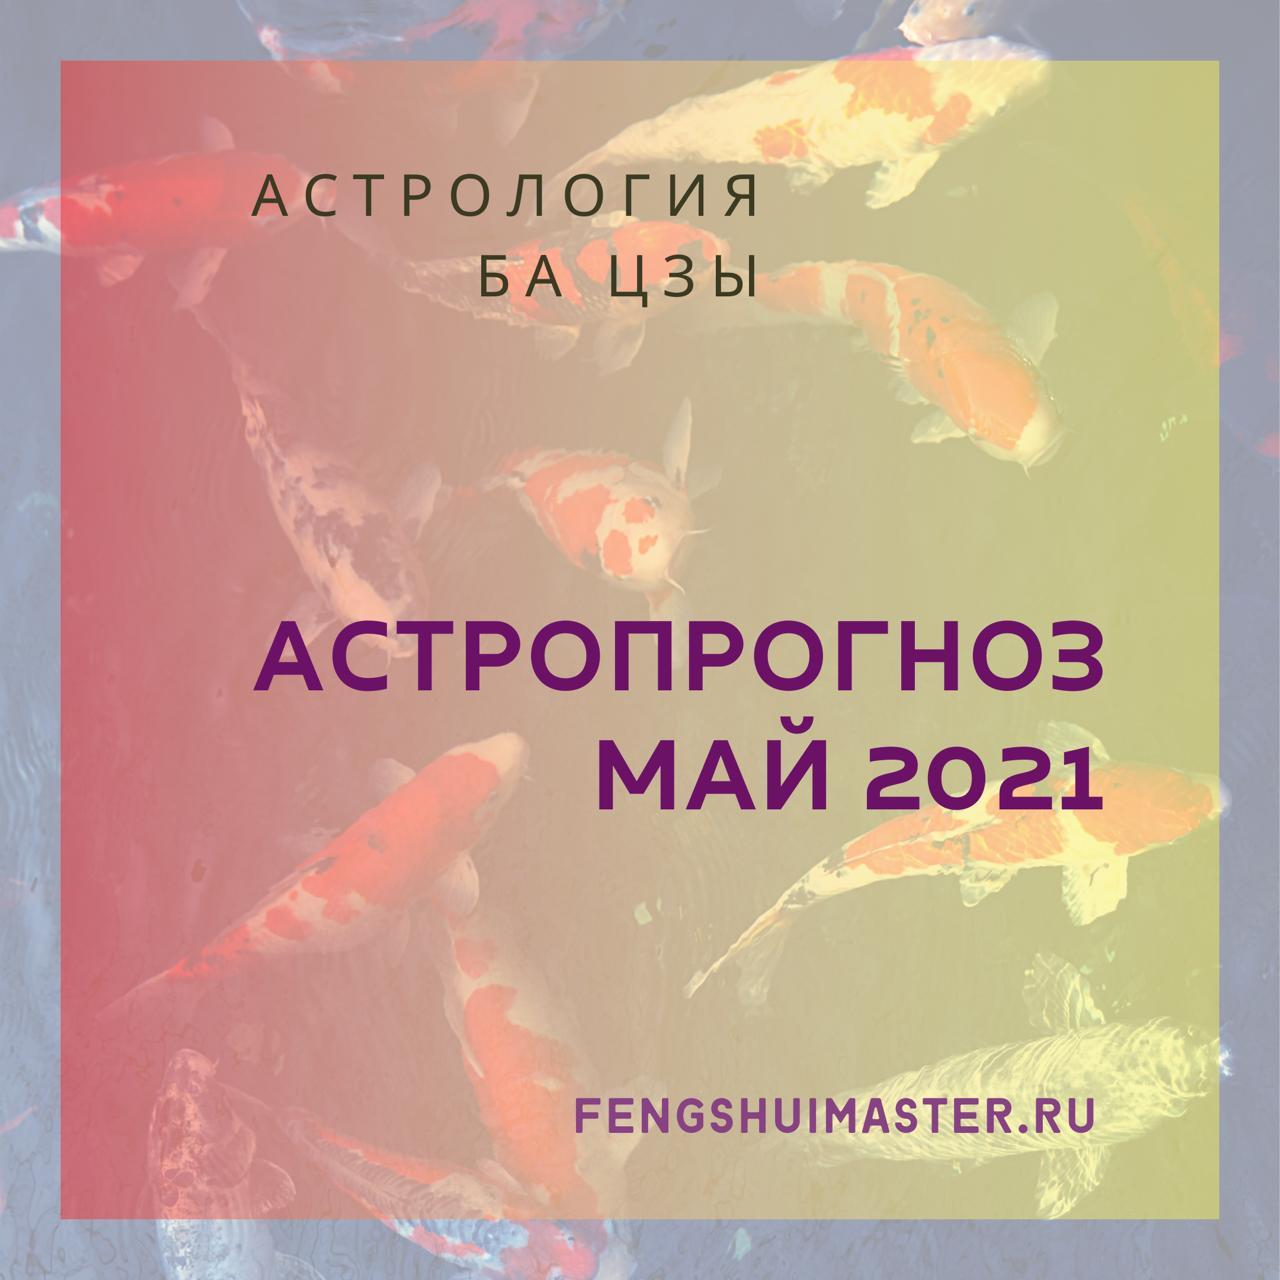 Астропрогноз май 2021 - Fengshuimaster.ru